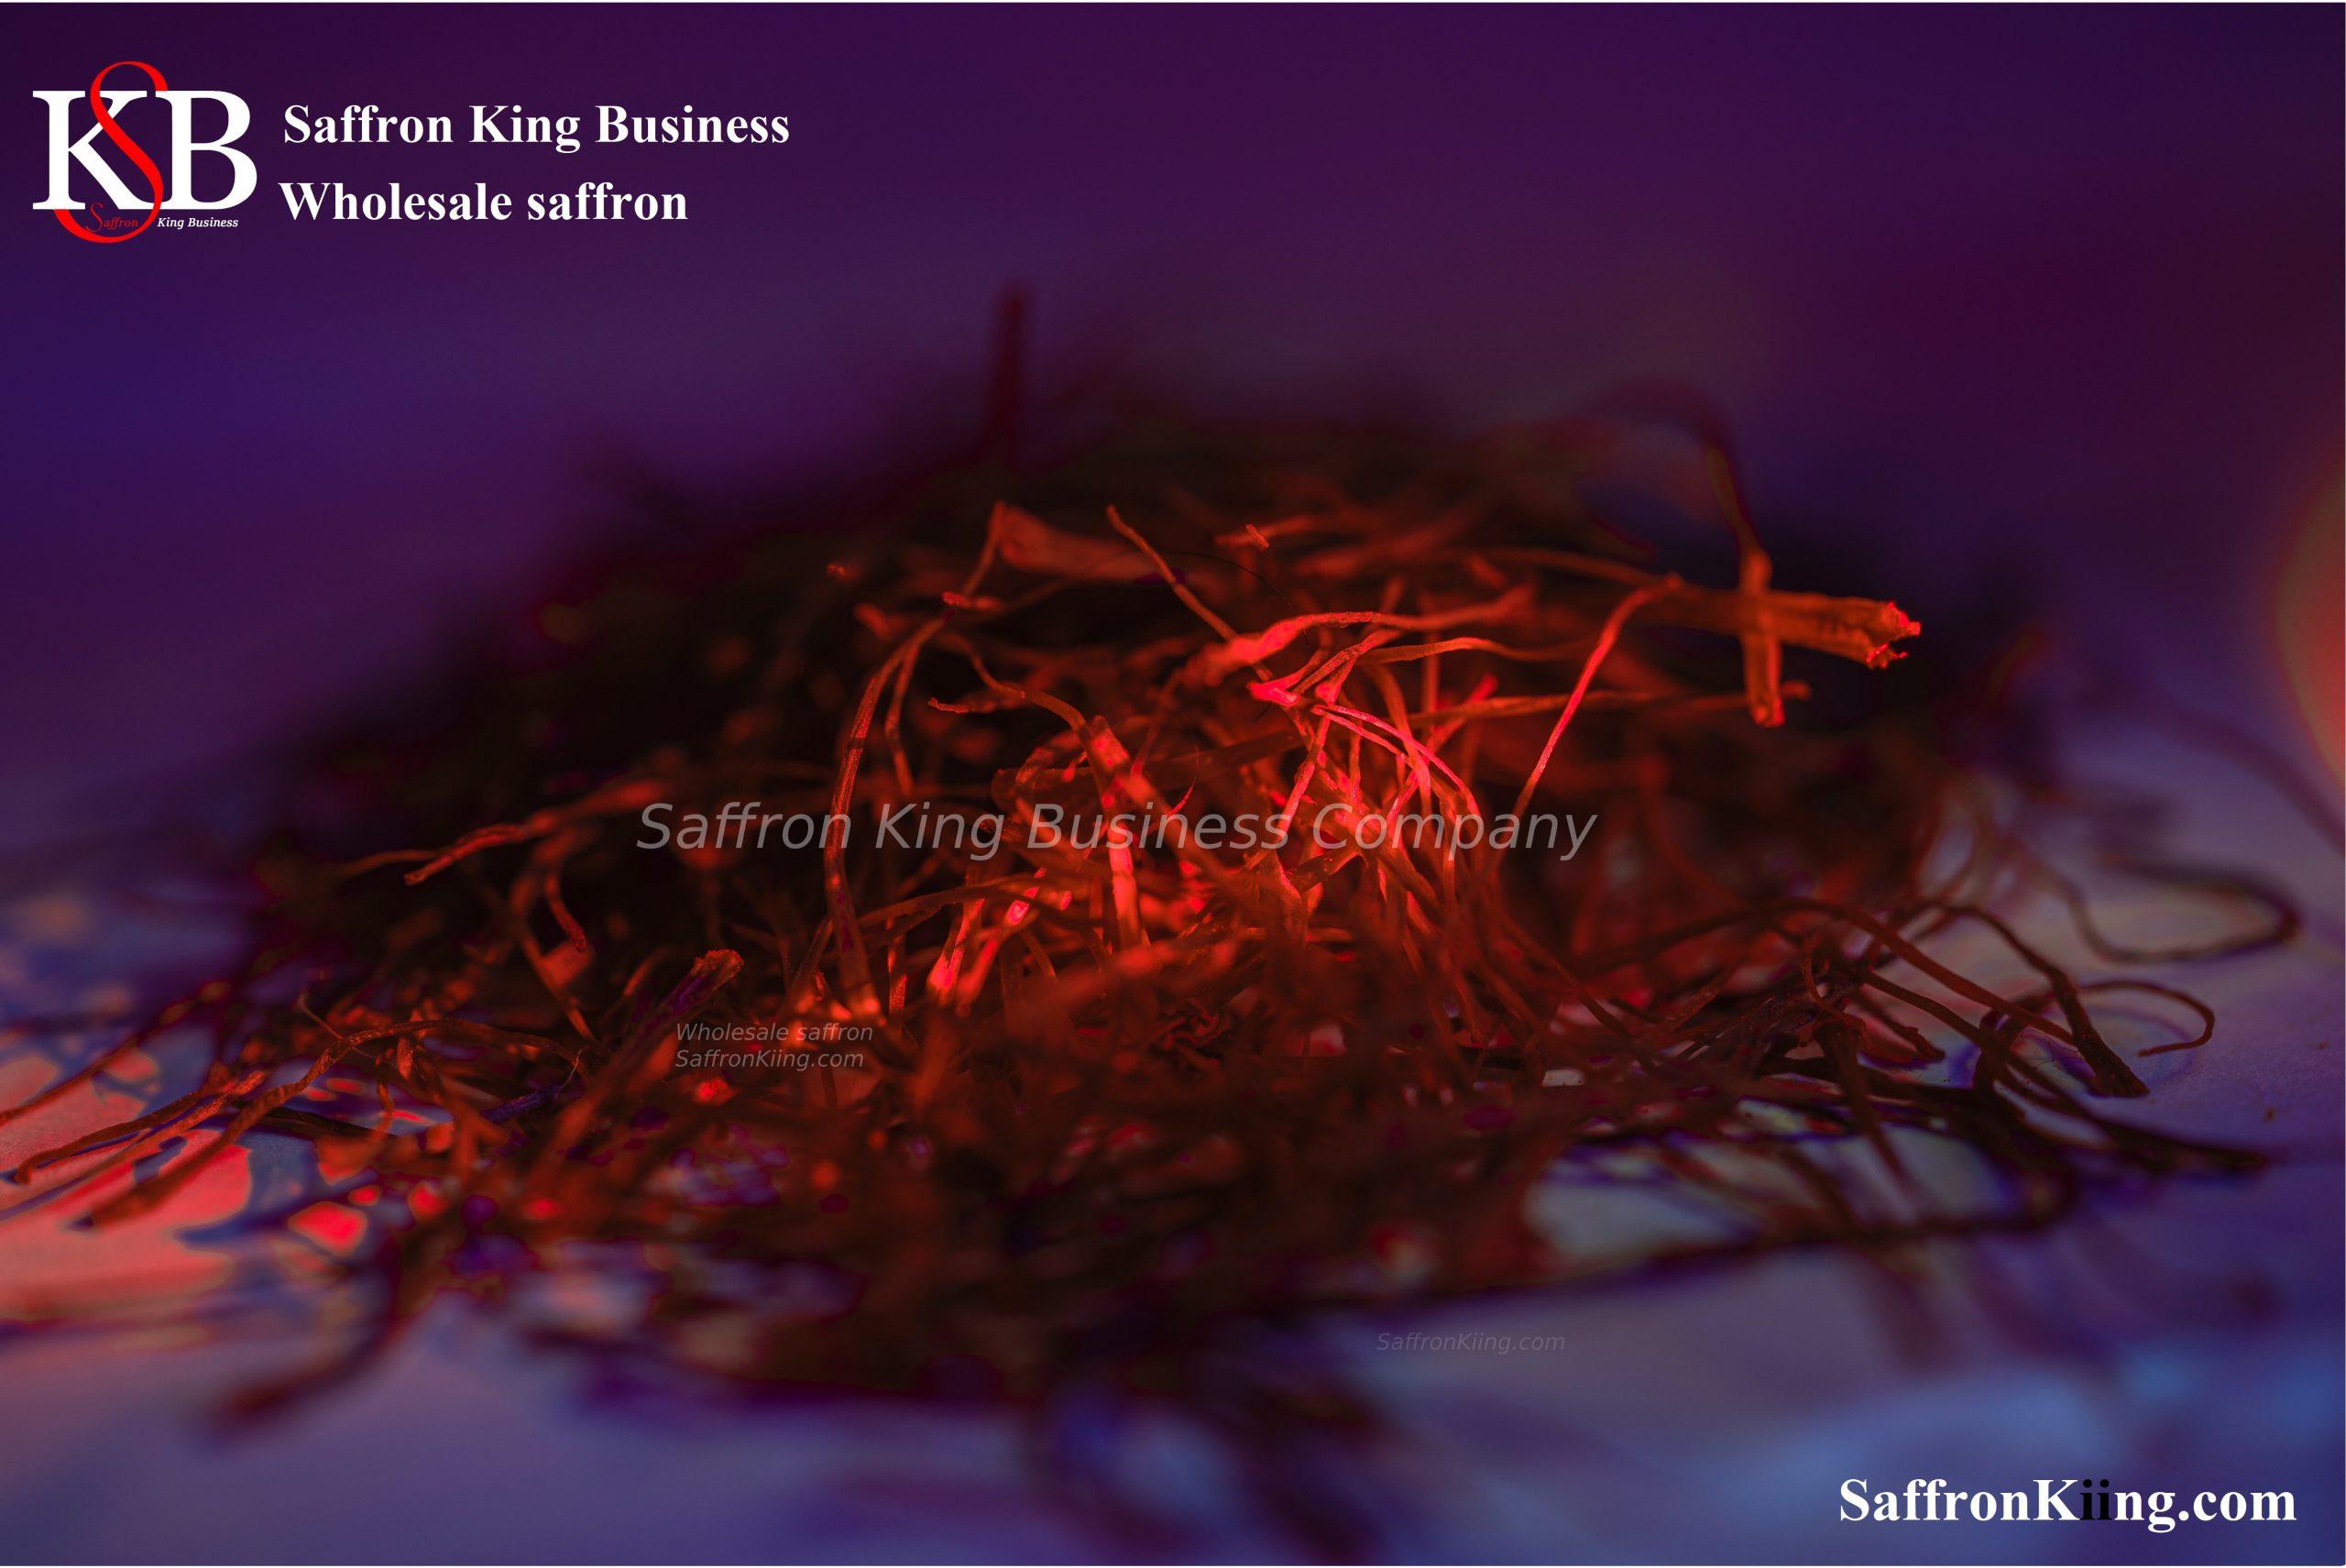 Buy saffron online in the Netherlands